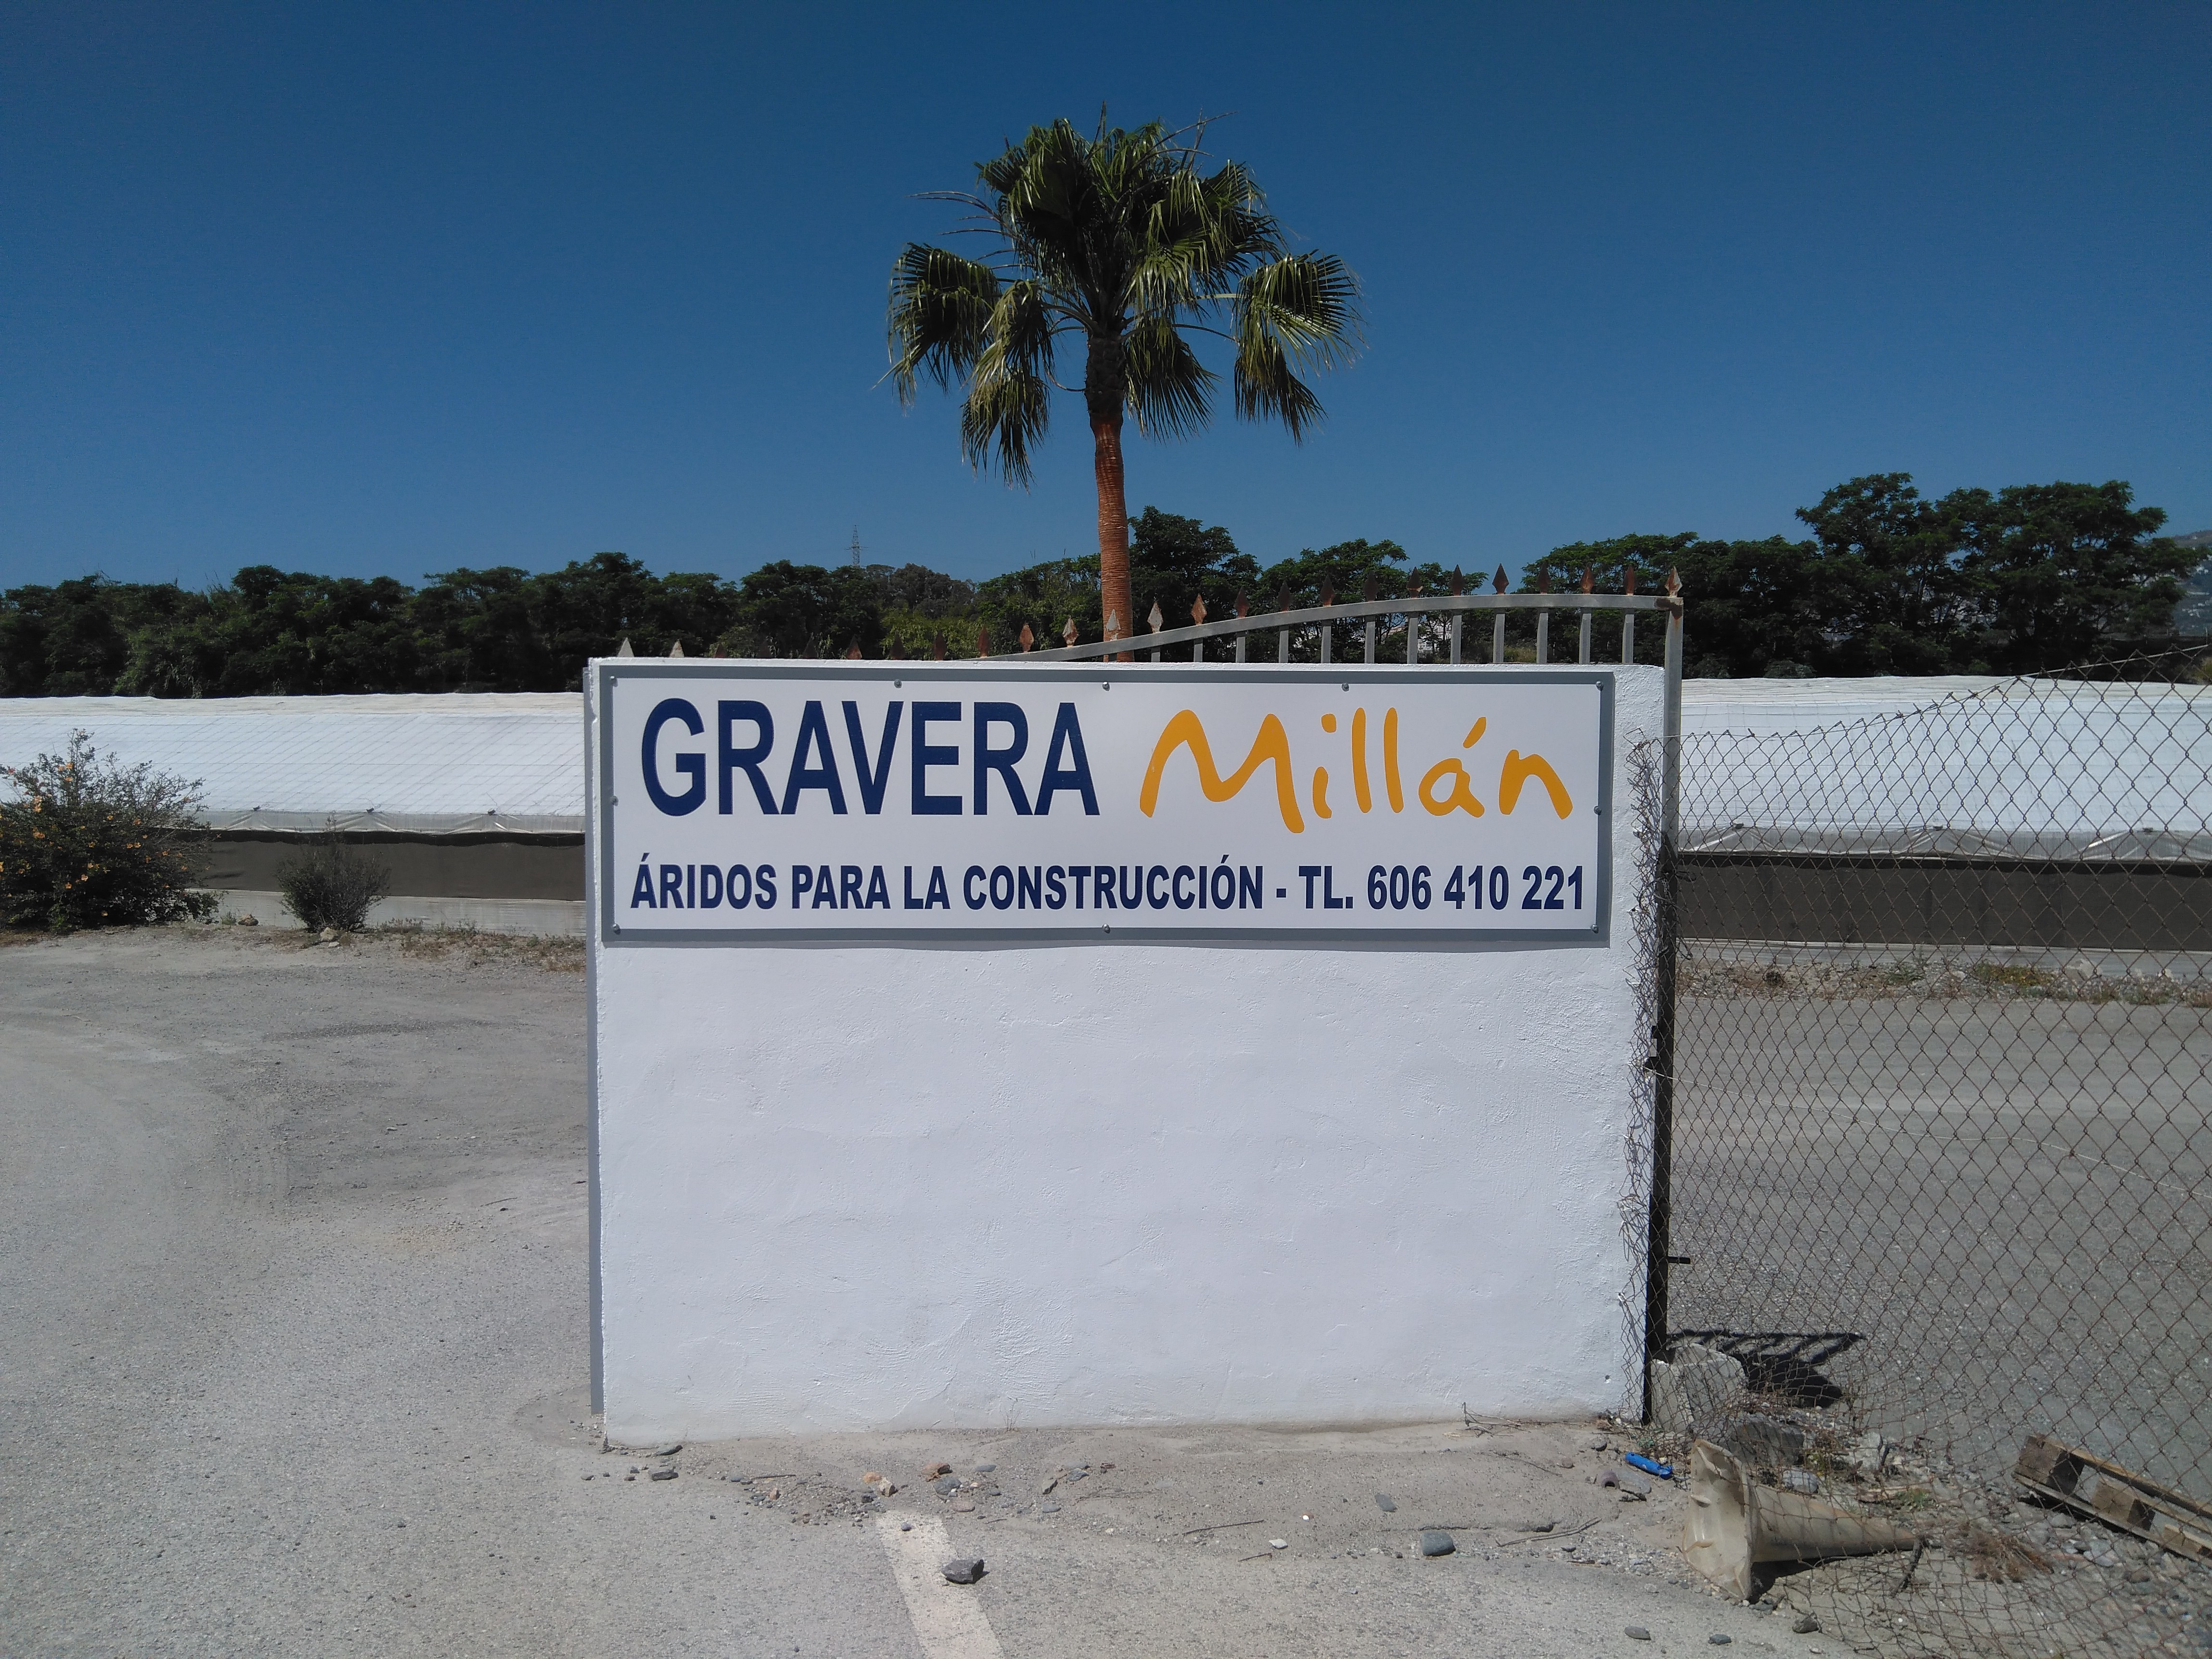 Gravera Millán